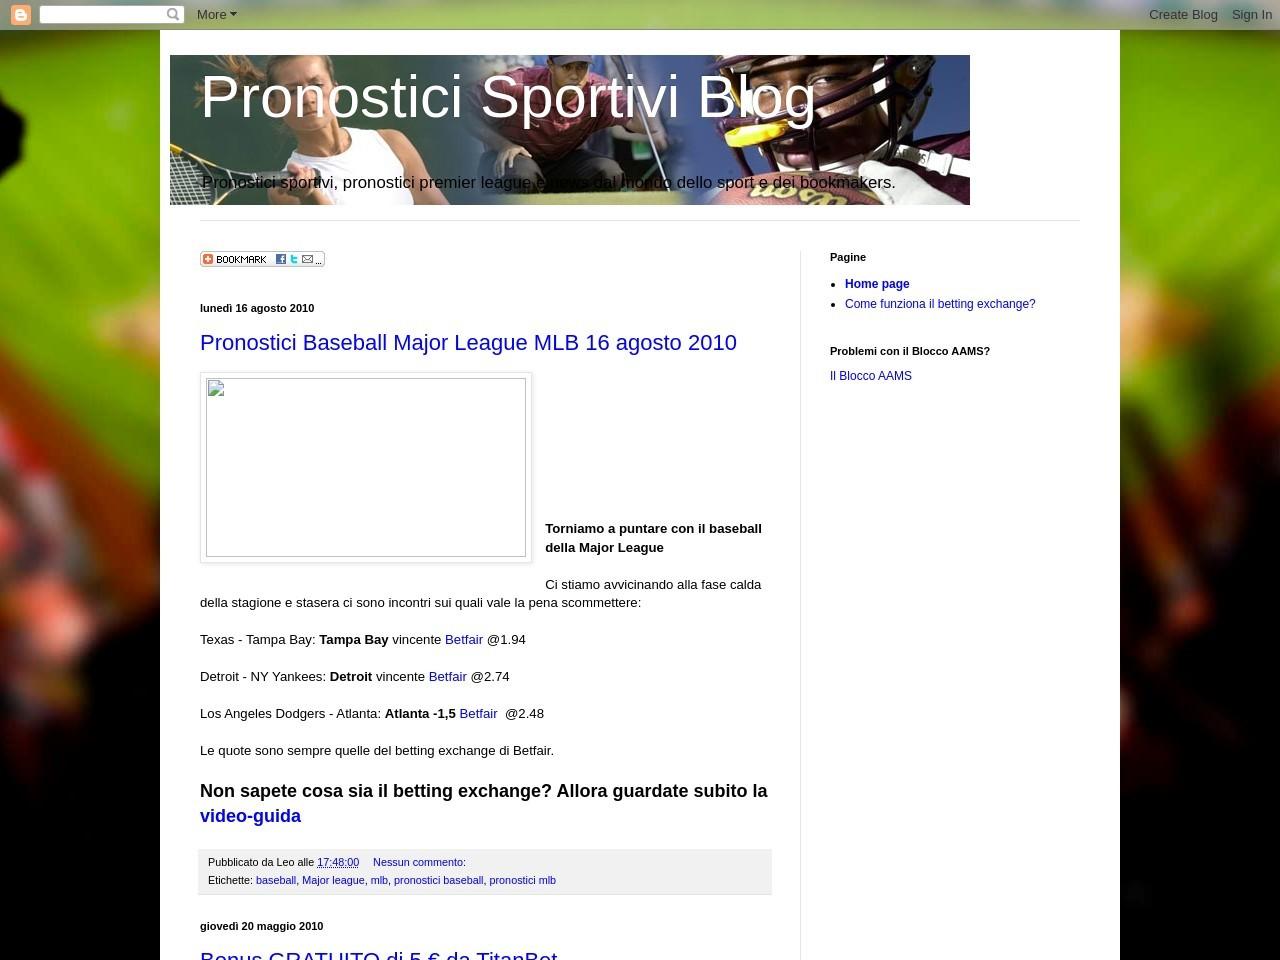 pronostici-sportivi-blog